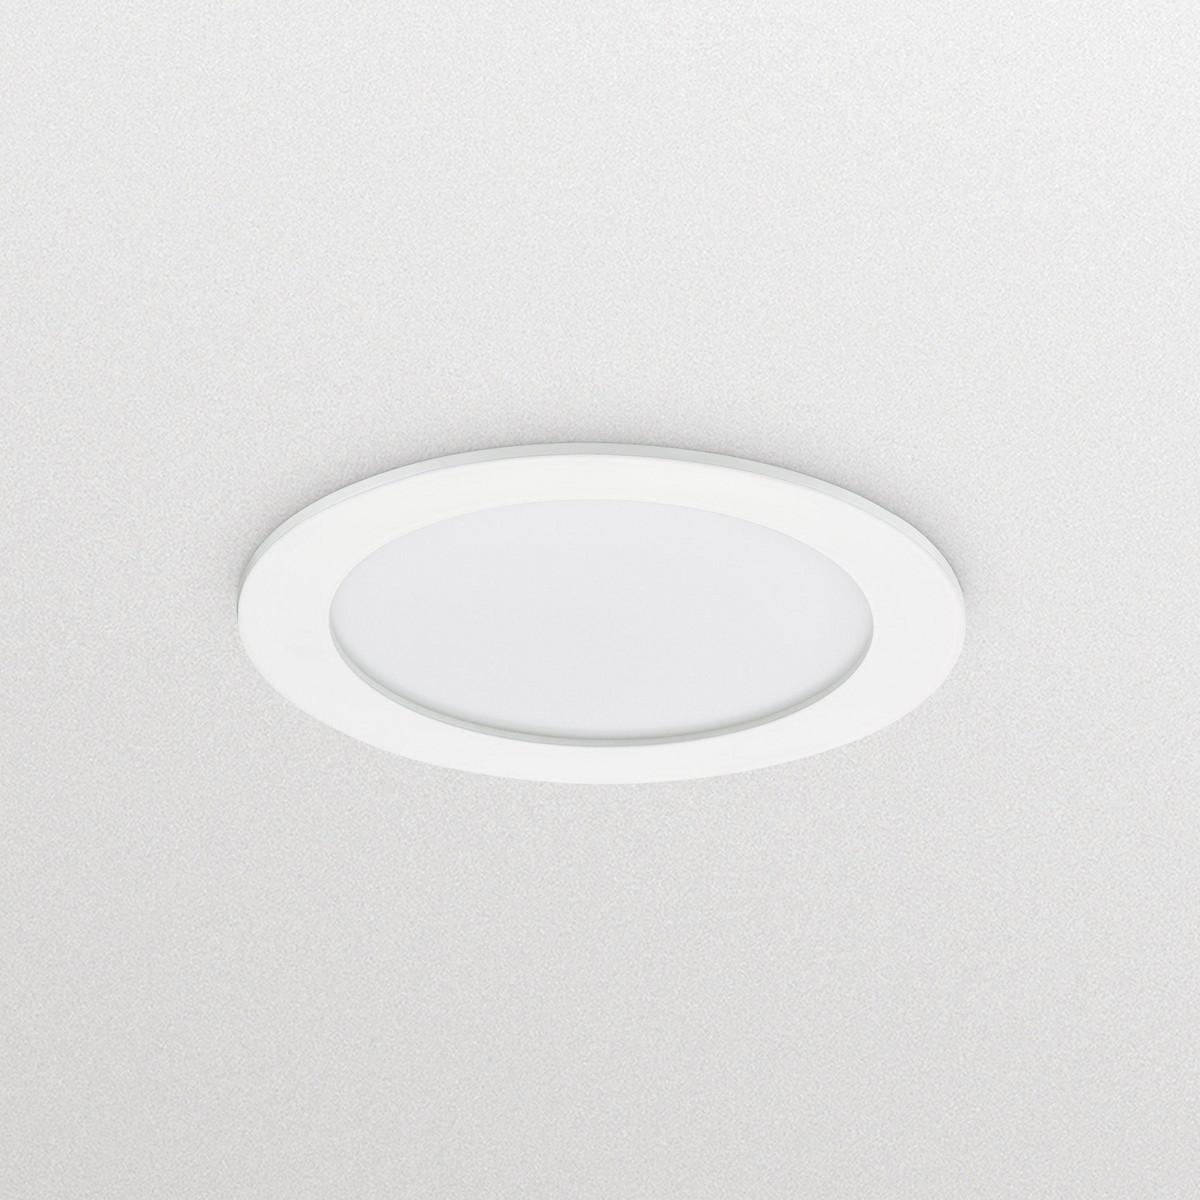 Philips CoreLine SlimDownlight DN145B LED 1100lm/830 DALI Hvid